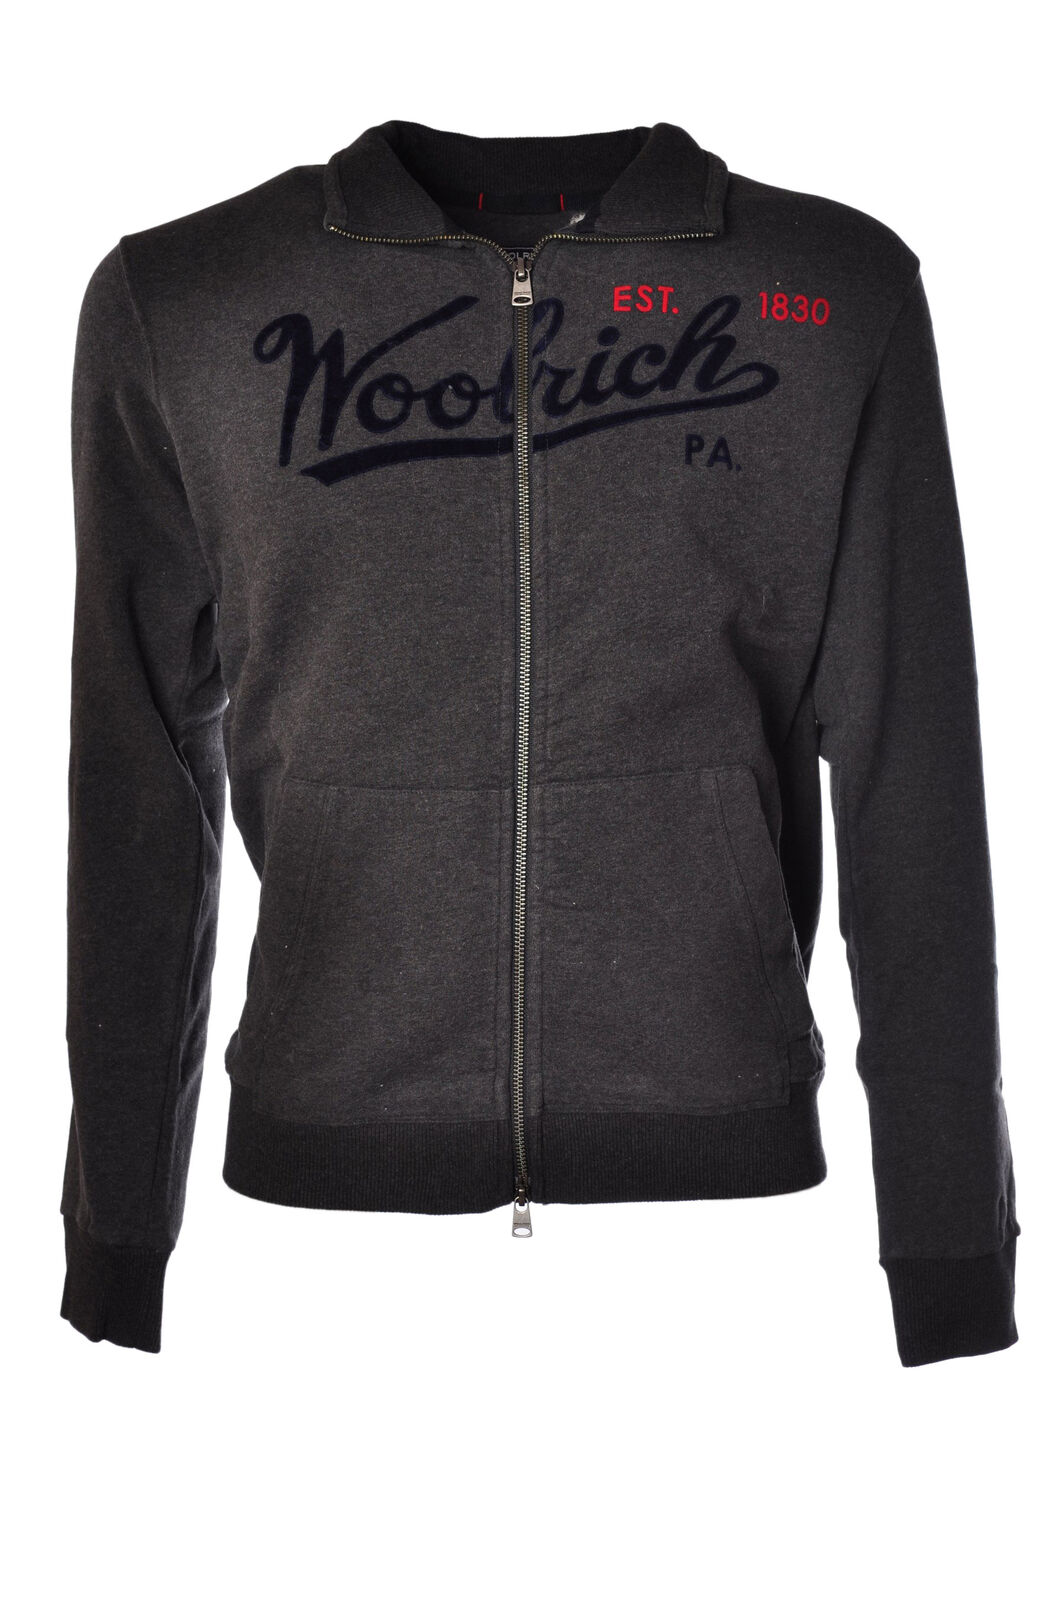 Woolrich - Topwear-Sweatshirts - Man - Grau - 879818C183744